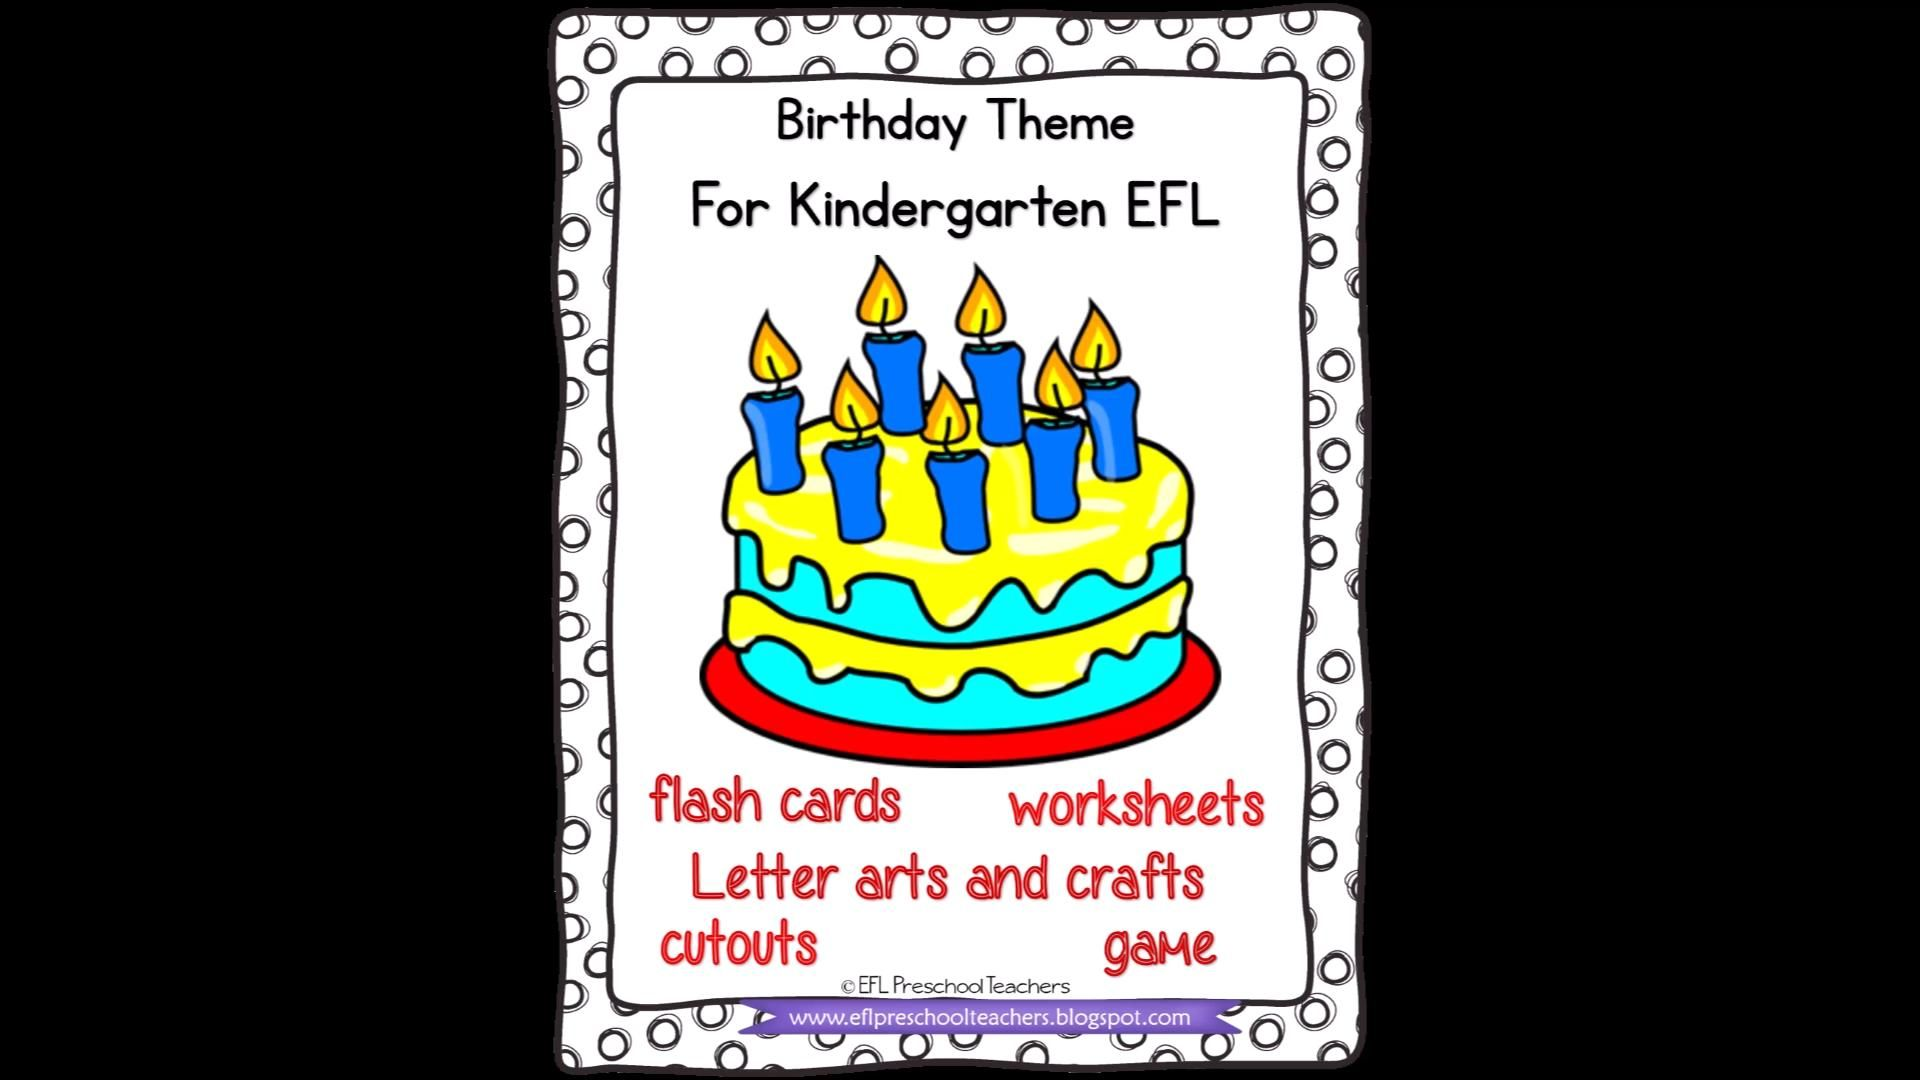 Happy Birthday For Ell Video Language Teaching Flashcards Esl Teachers [ 1080 x 1920 Pixel ]